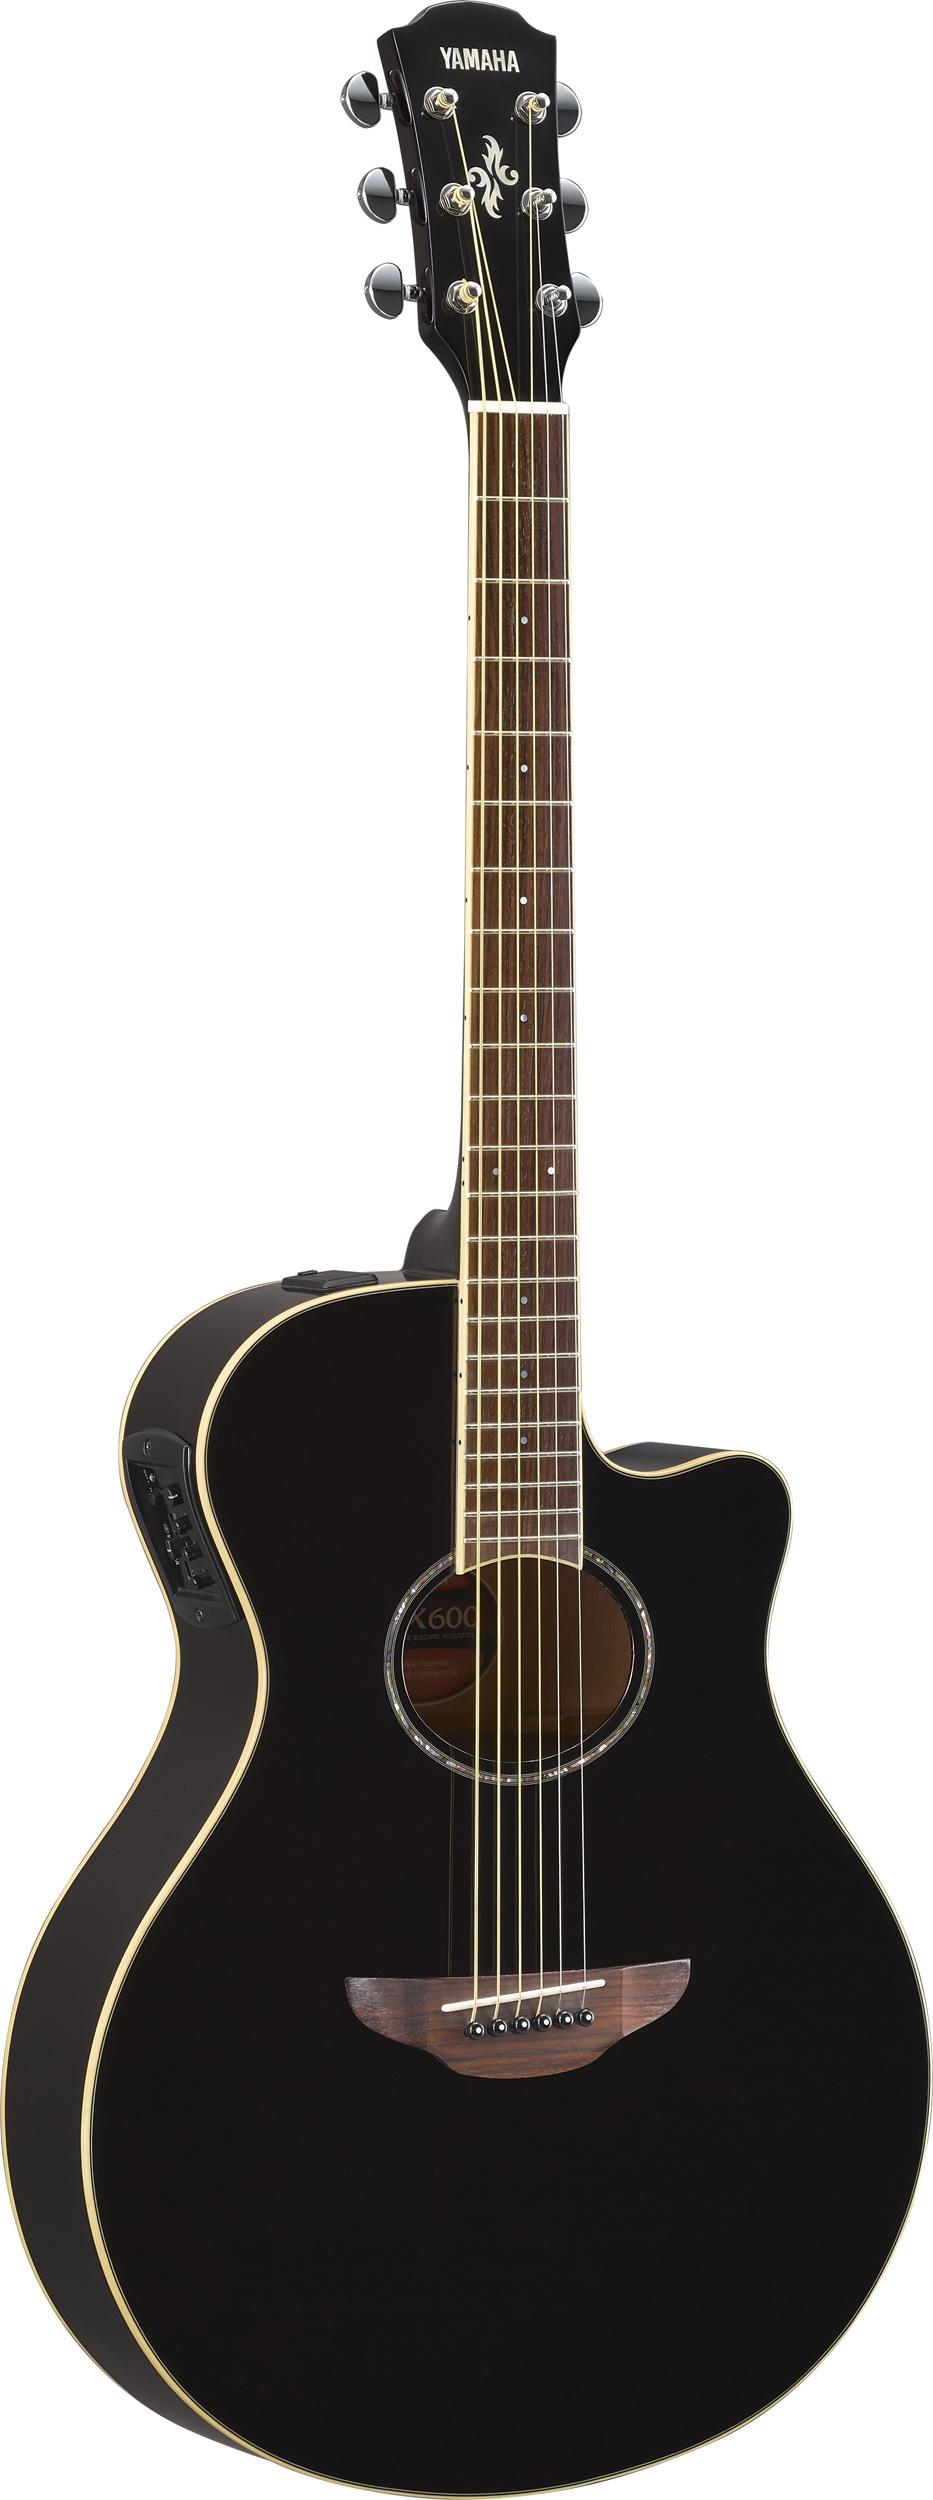 yamaha apx600 bk elektro akustik gitarre schwarz gitarre. Black Bedroom Furniture Sets. Home Design Ideas